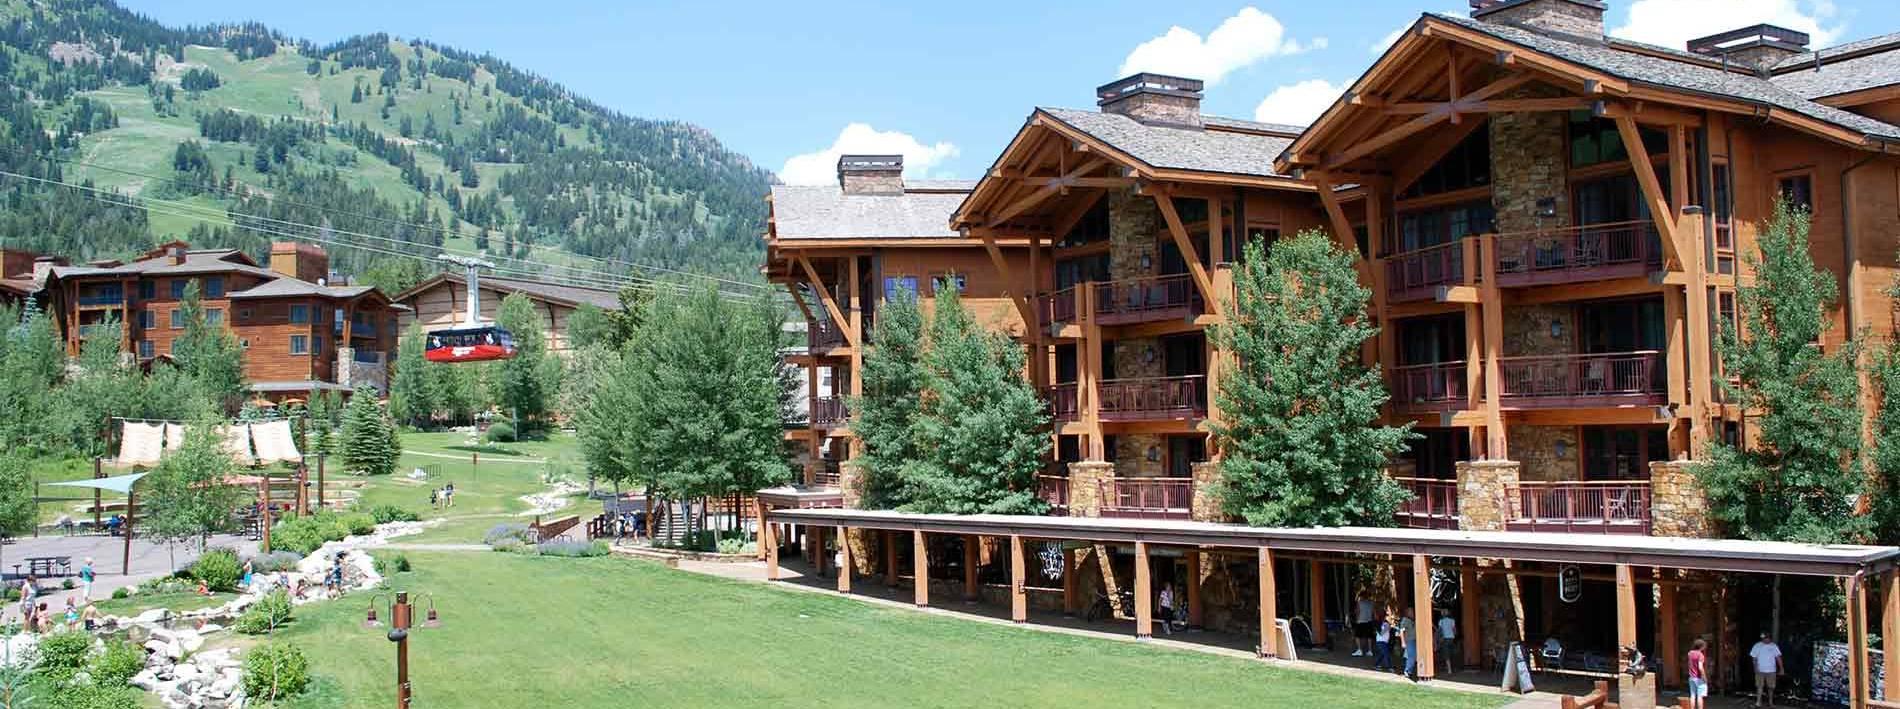 3285 West Village Drive #302,Teton Village,Wyoming,3 Bedrooms Bedrooms,3.5 BathroomsBathrooms,Private Home,3285 West Village Drive #302 ,1003